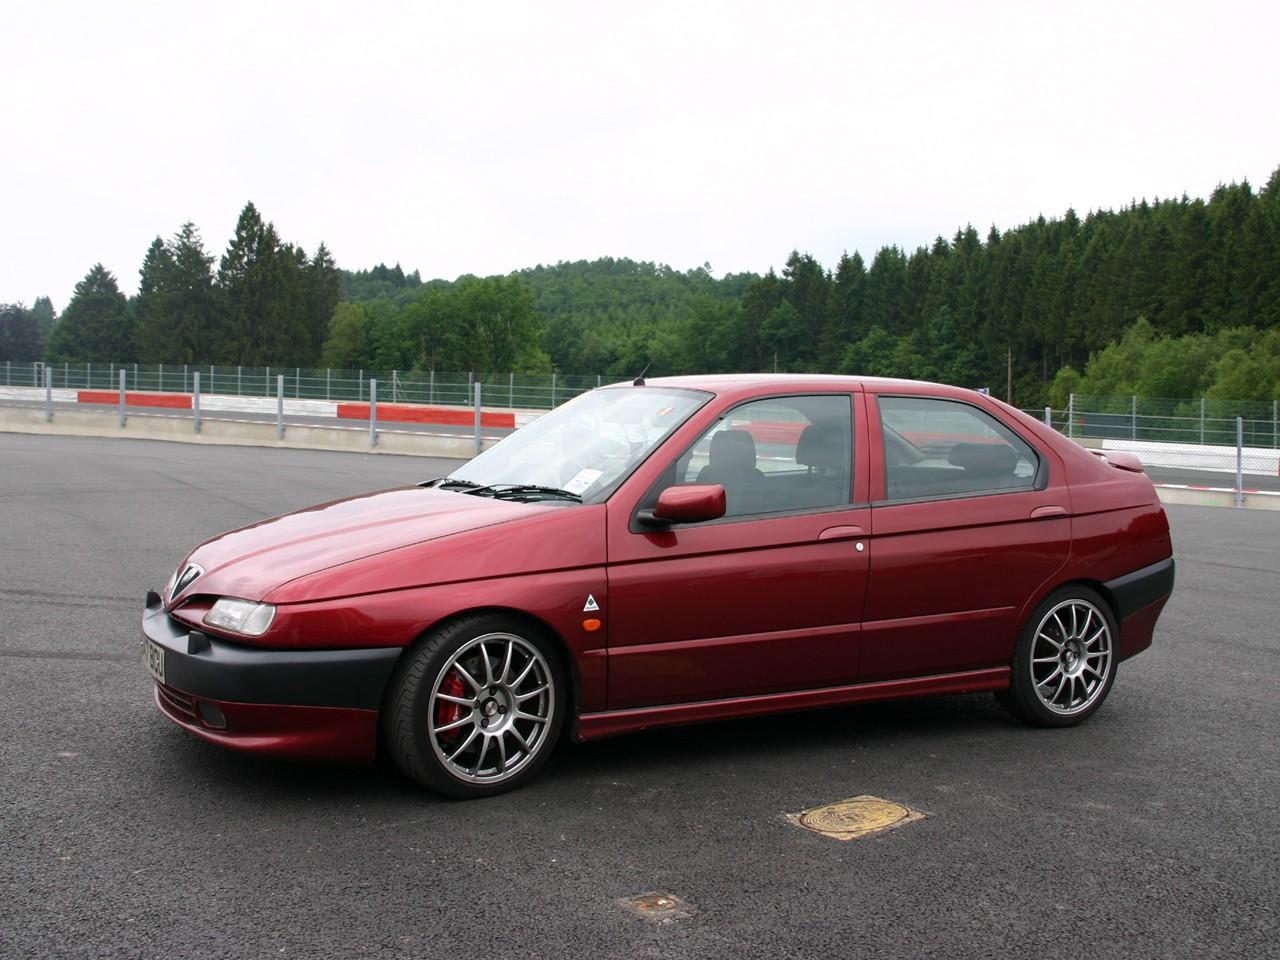 Alfa Romeo 146  1995, 1996, 1997, 1998, 1999, 2000